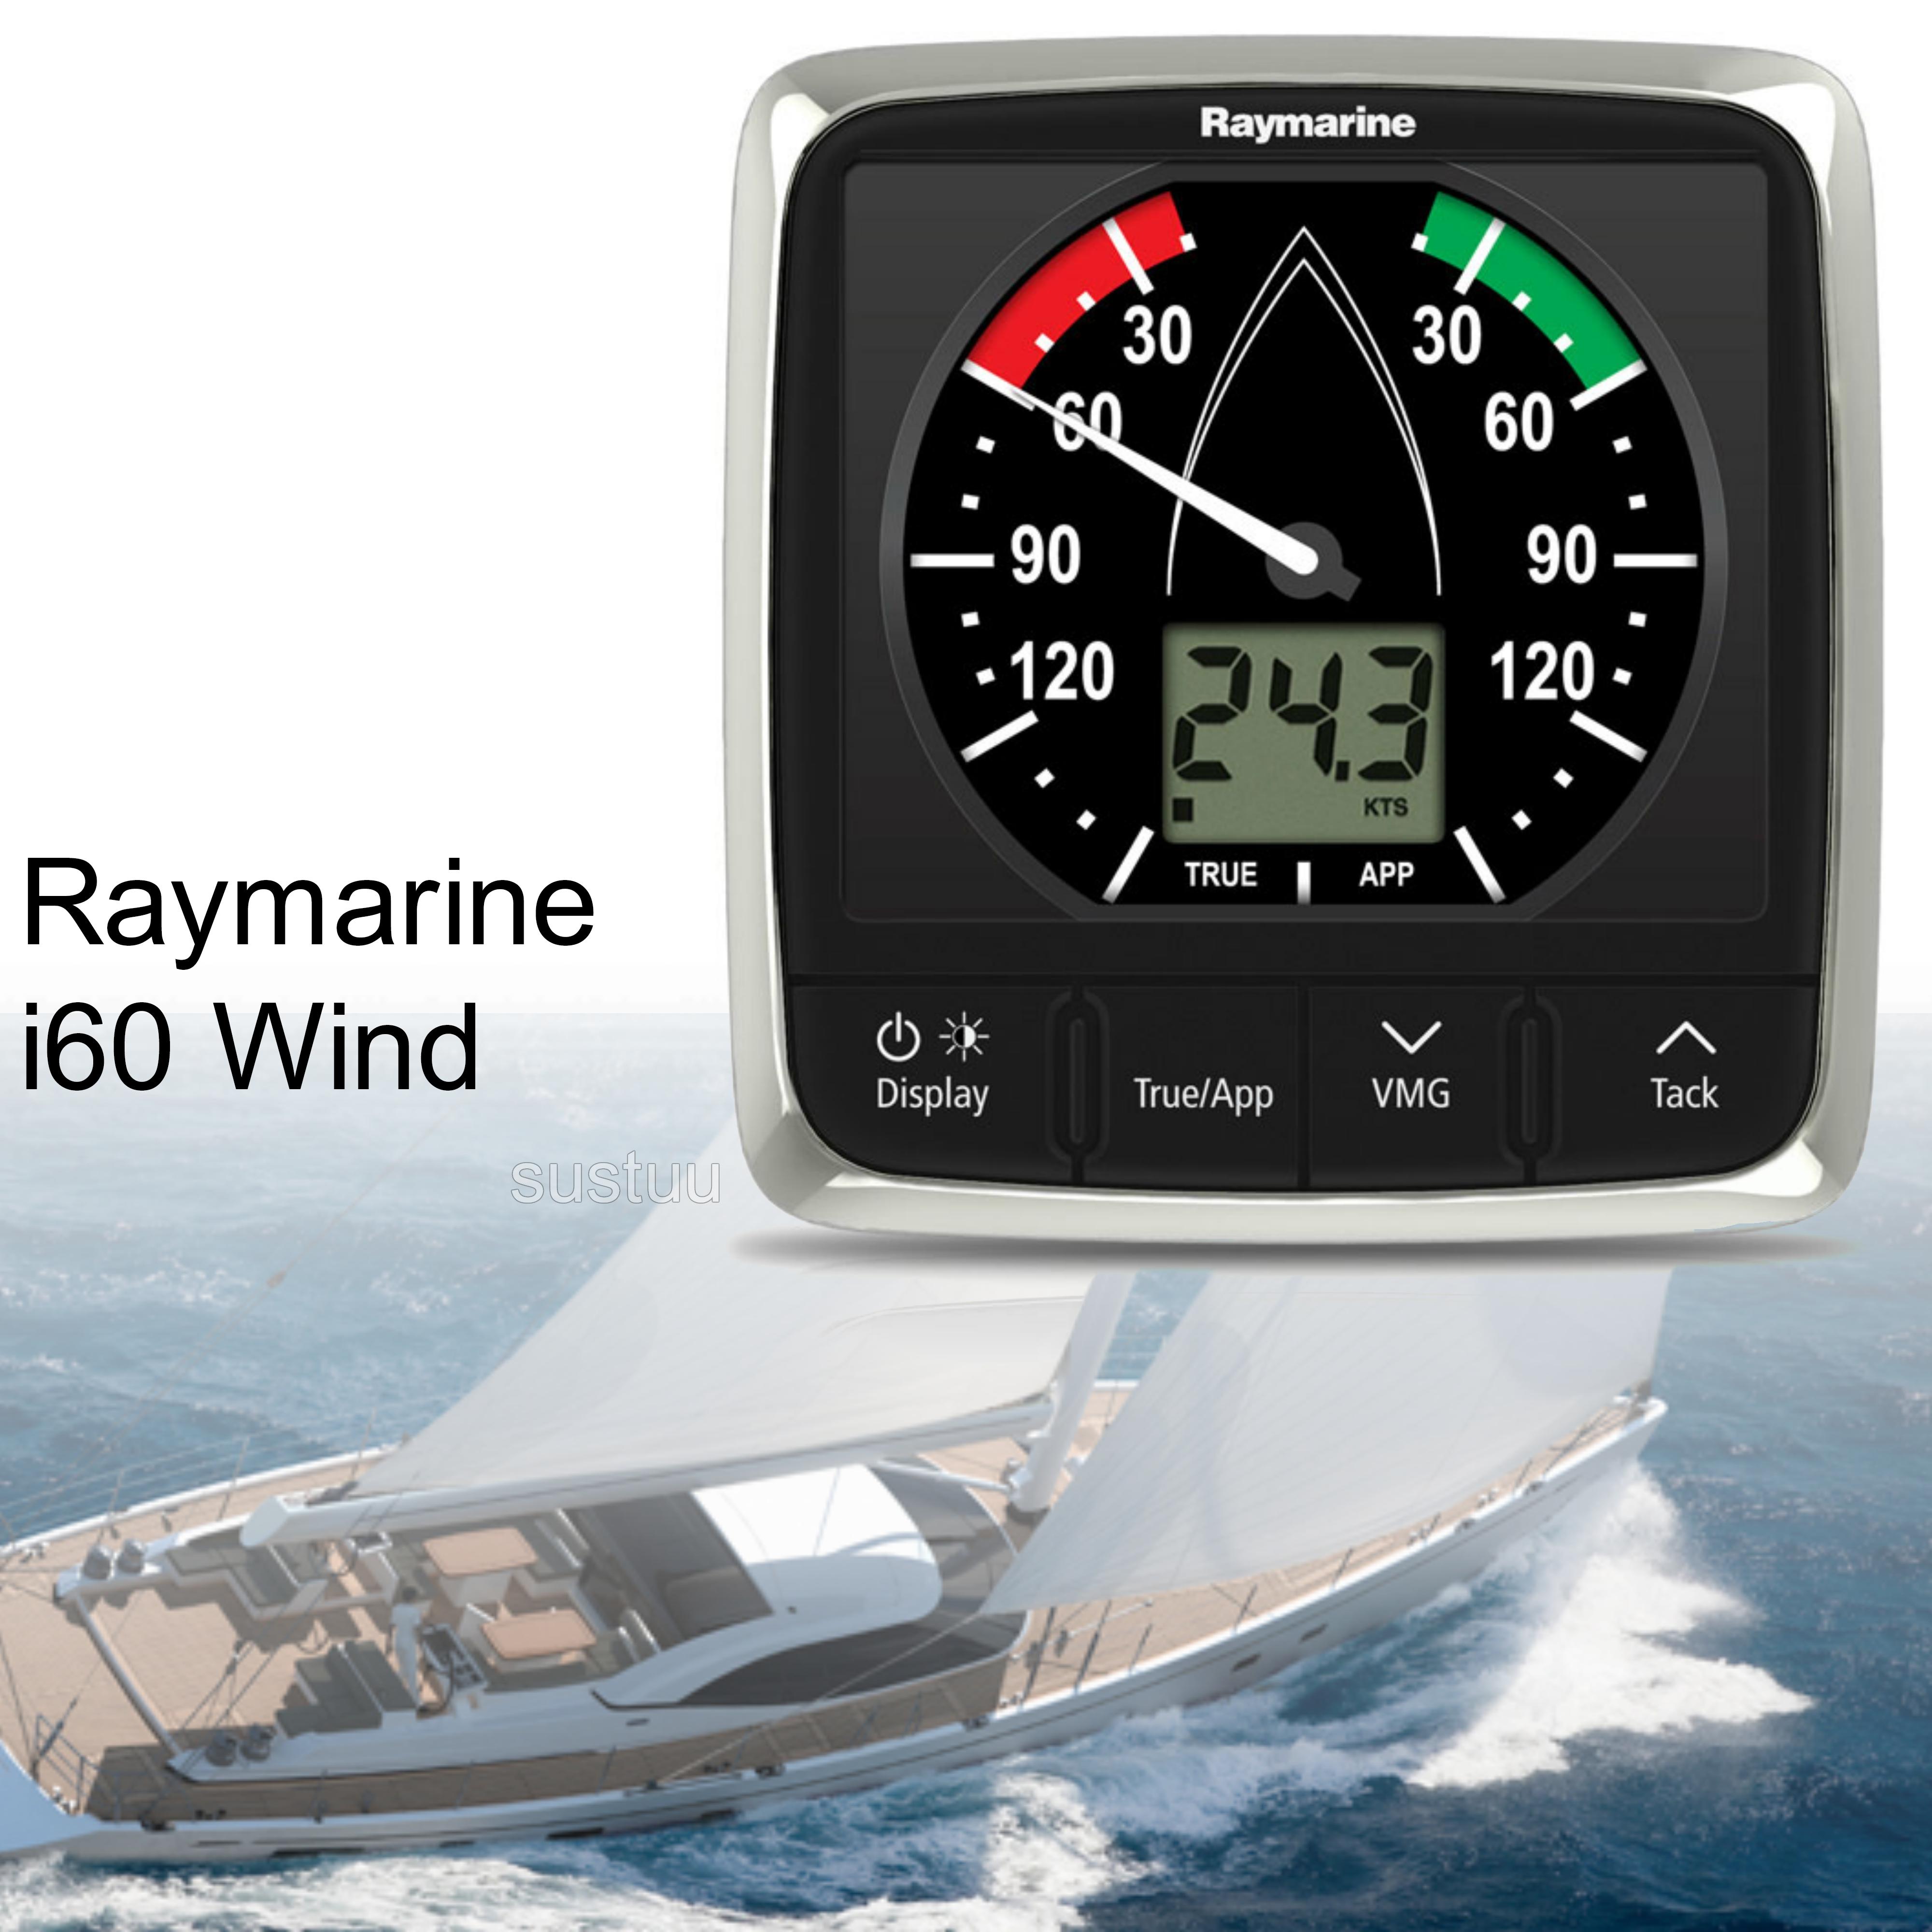 Raymarine E70061|i60 Wind Instrument Display|Analogue & Digital|SeaTalk|For Sailboaters